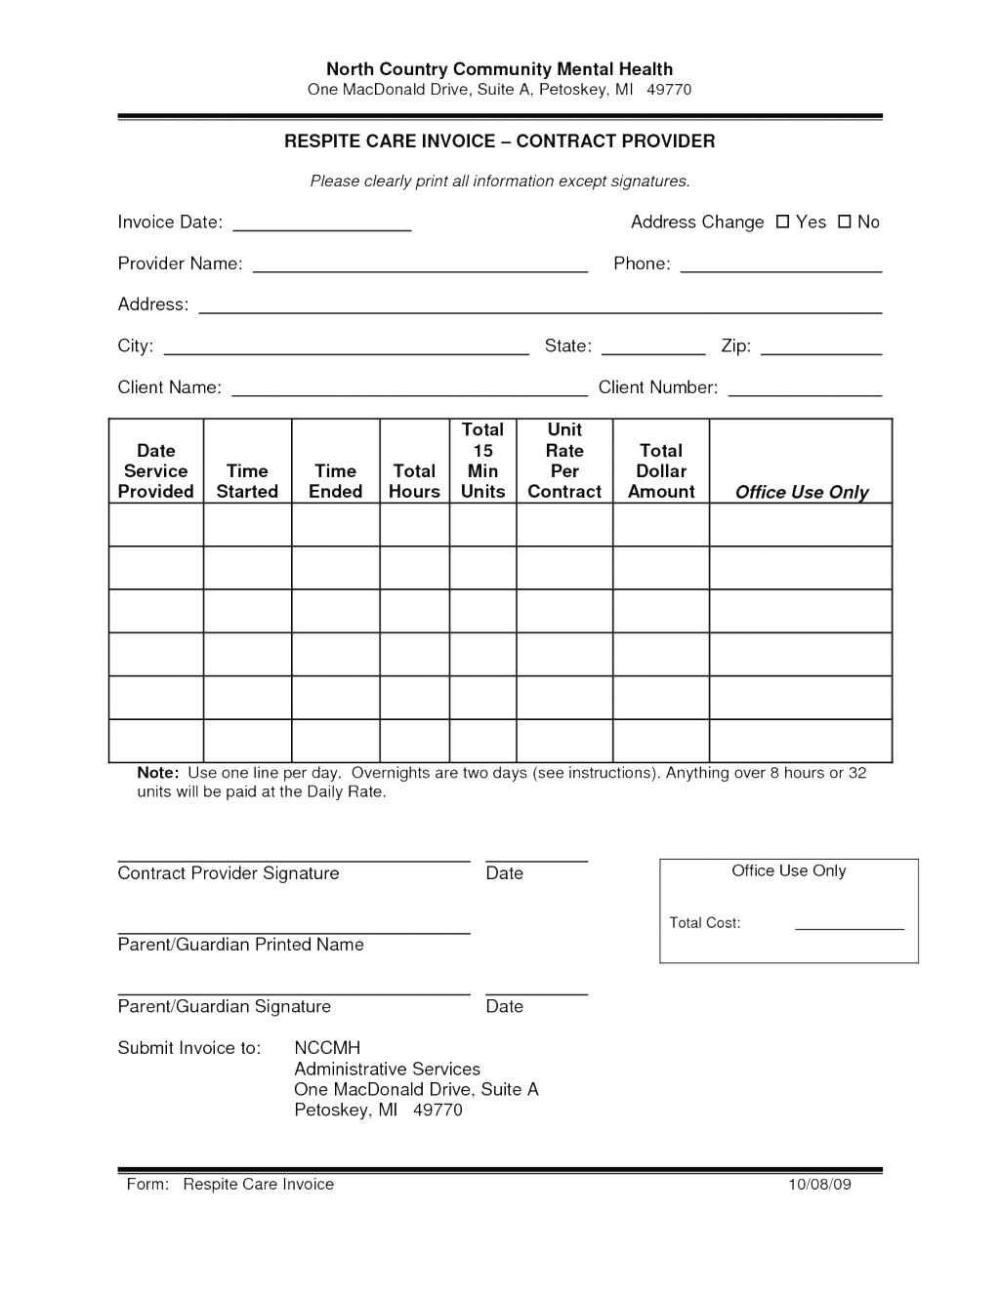 Home Care Invoice Template Health Receipt Letsgonepal With Home Health Care Invoice Template 10 Professional T Home Health Care Home Health Invoice Template